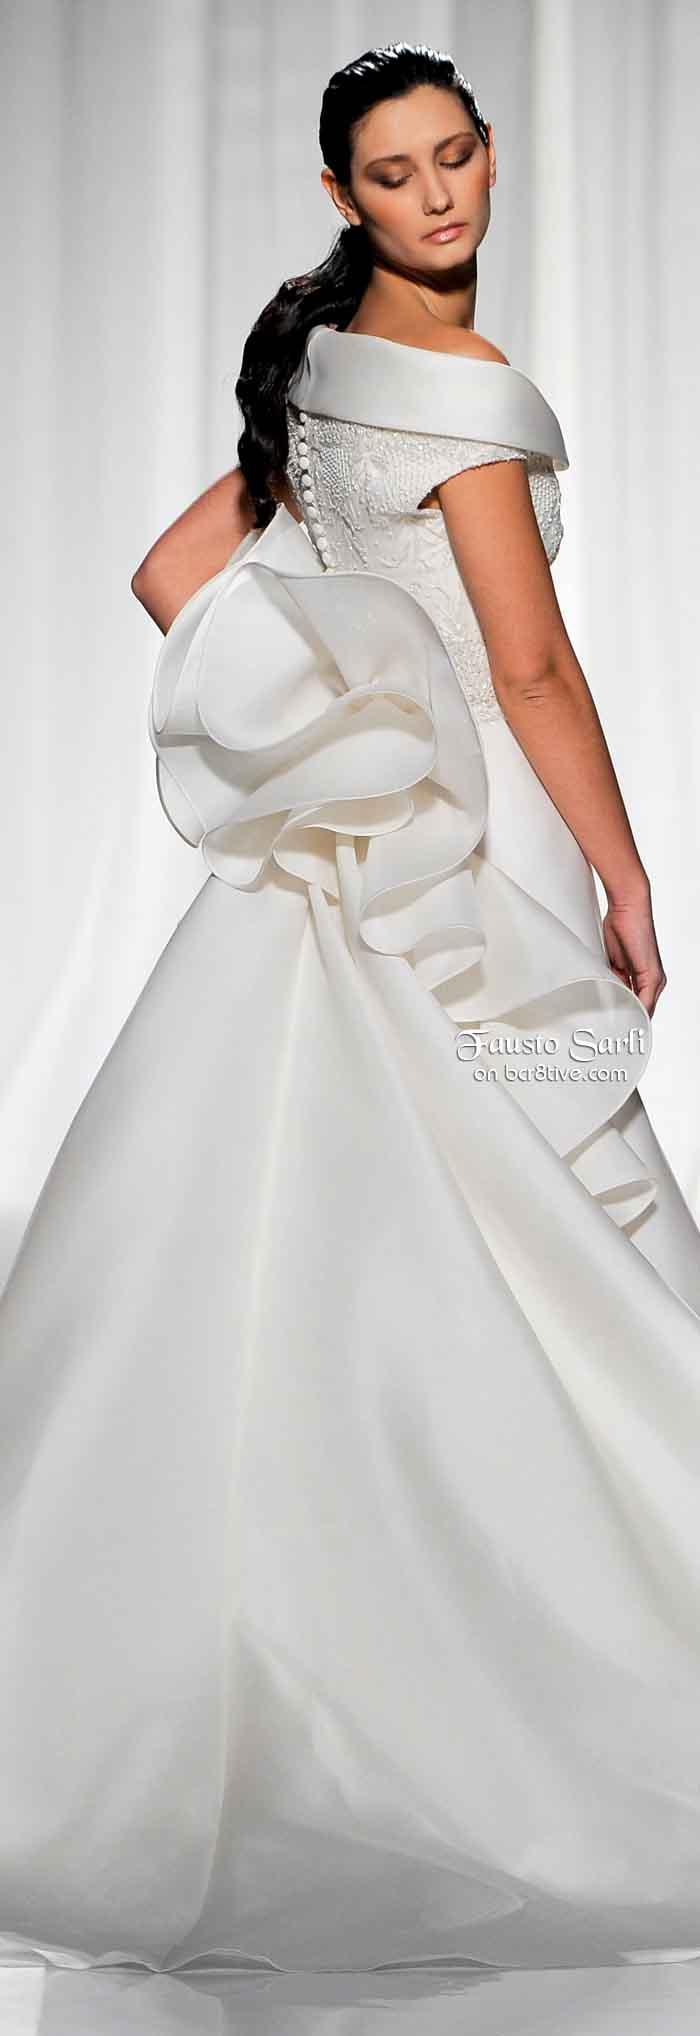 Fausto Sarli Spring Summer 2011 Haute Couture